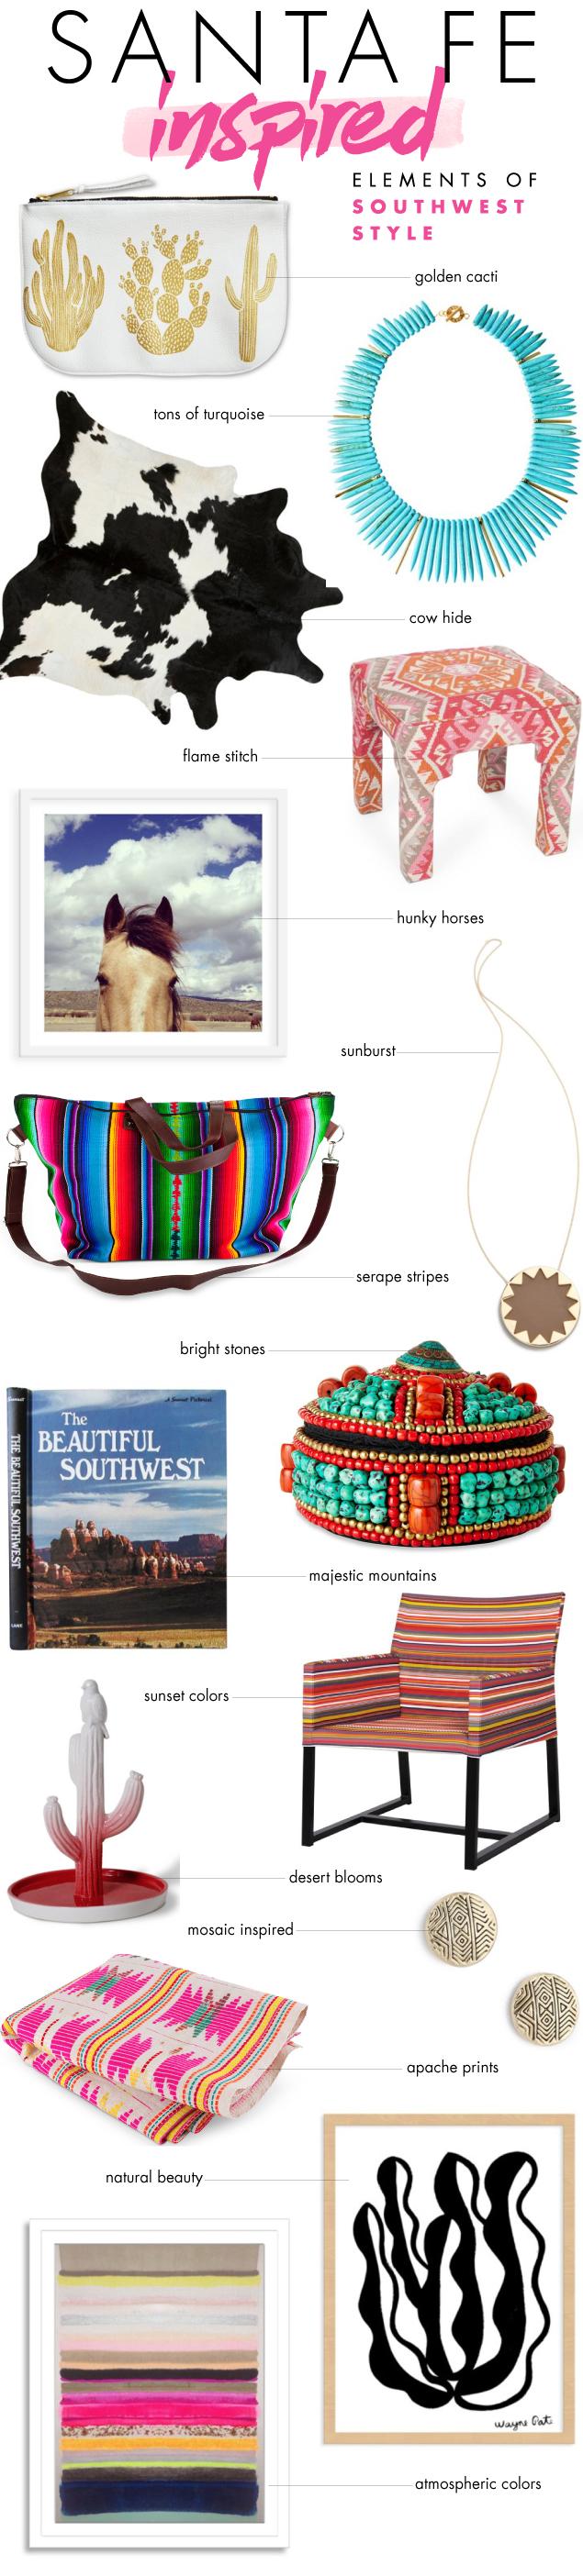 santa-fe-southwest-style-navajo